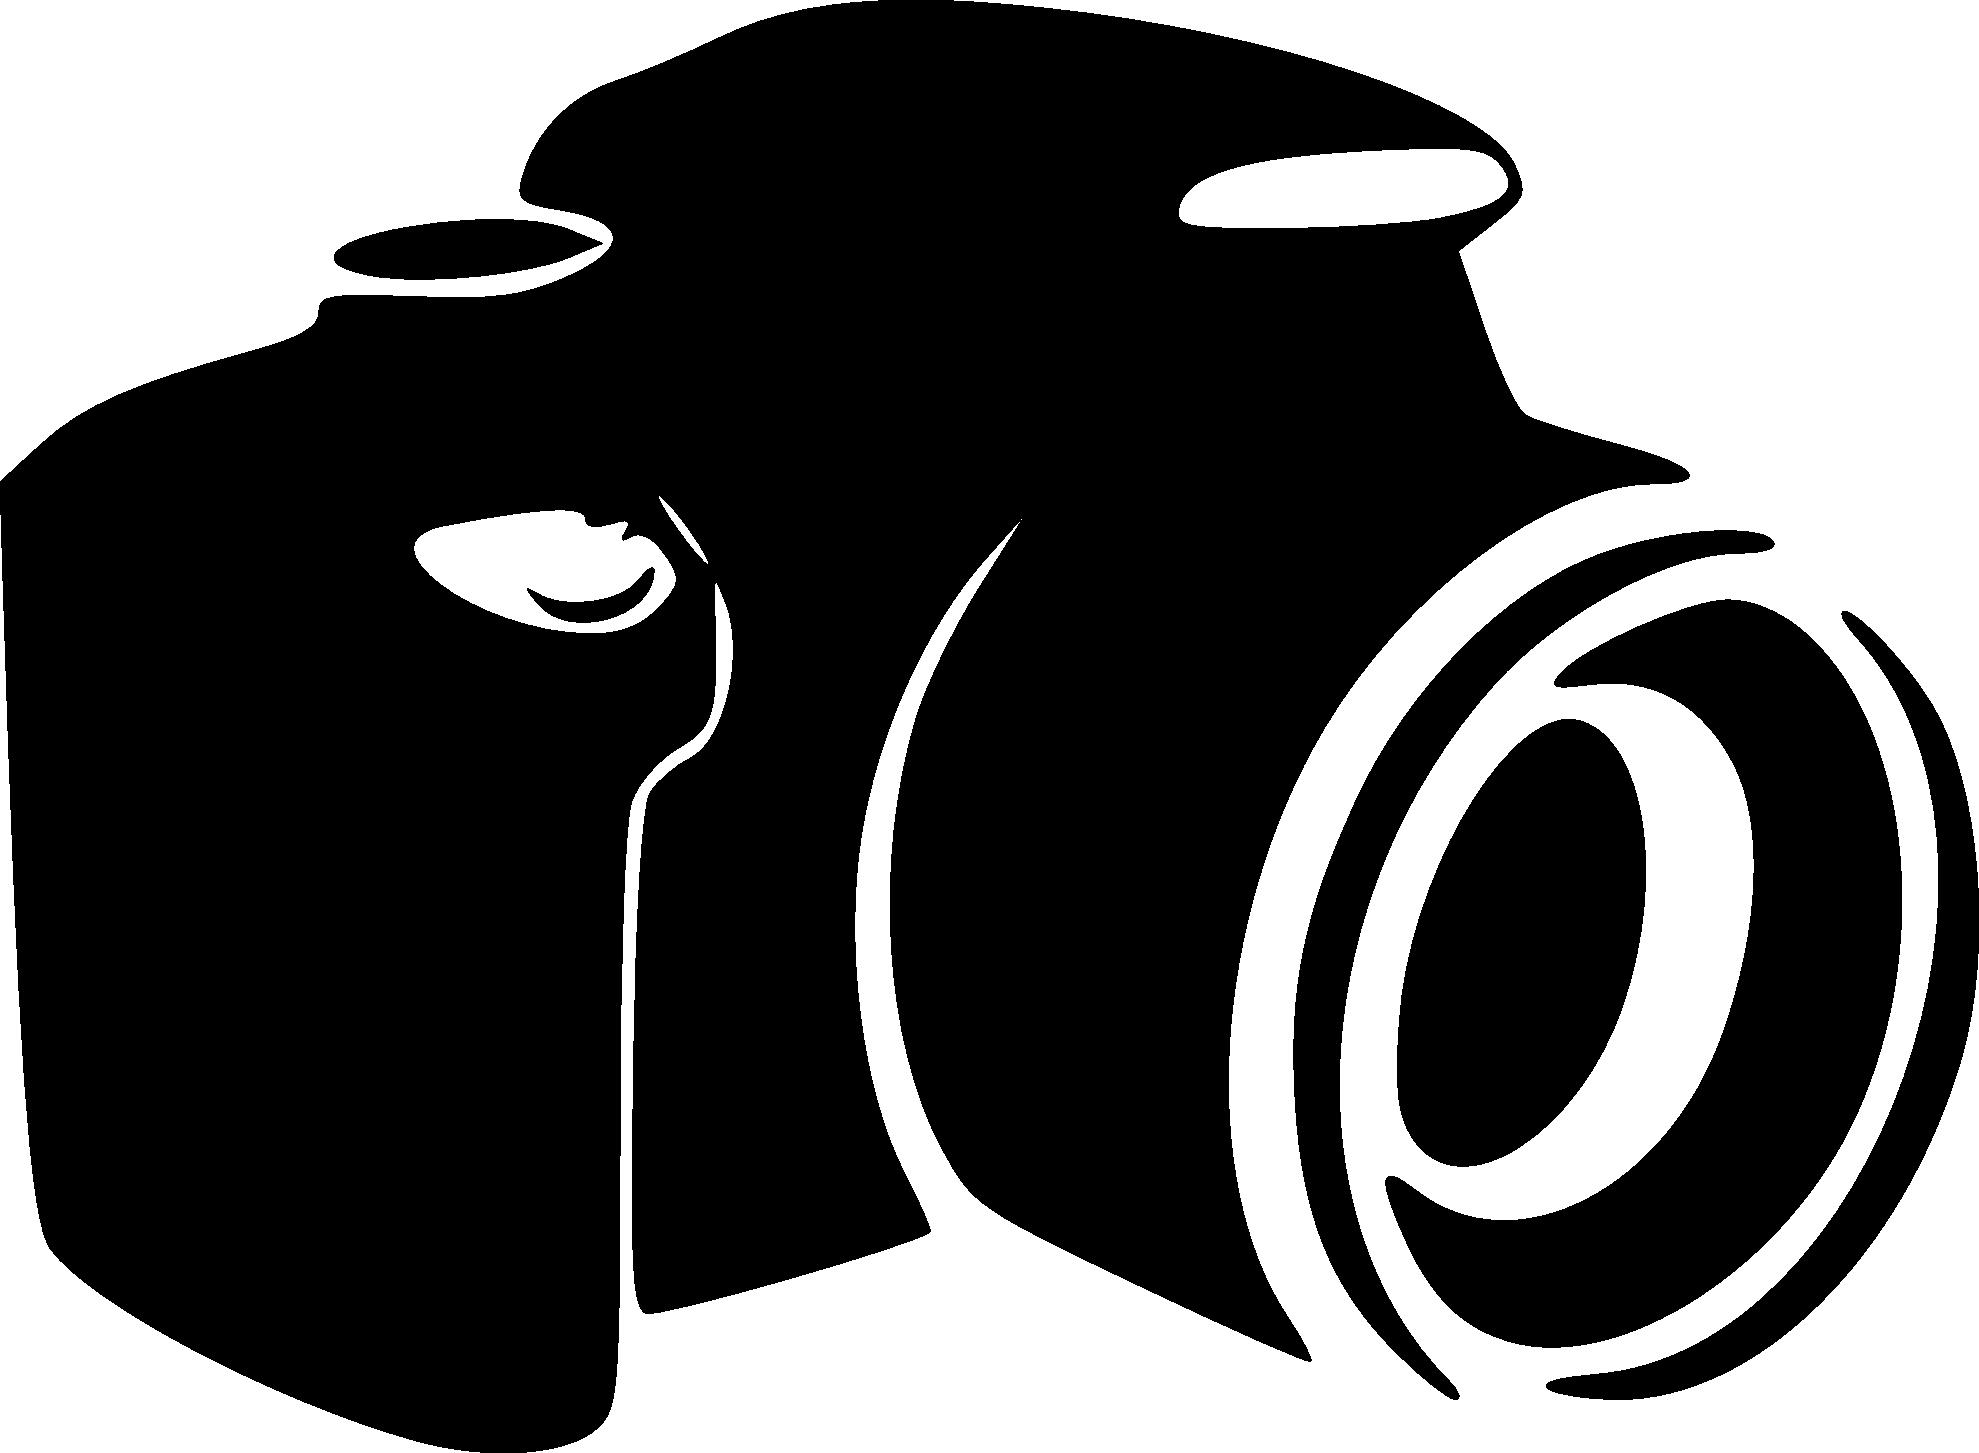 banner transparent library Kettlebell silhouette clipart. Camera logos pinterest